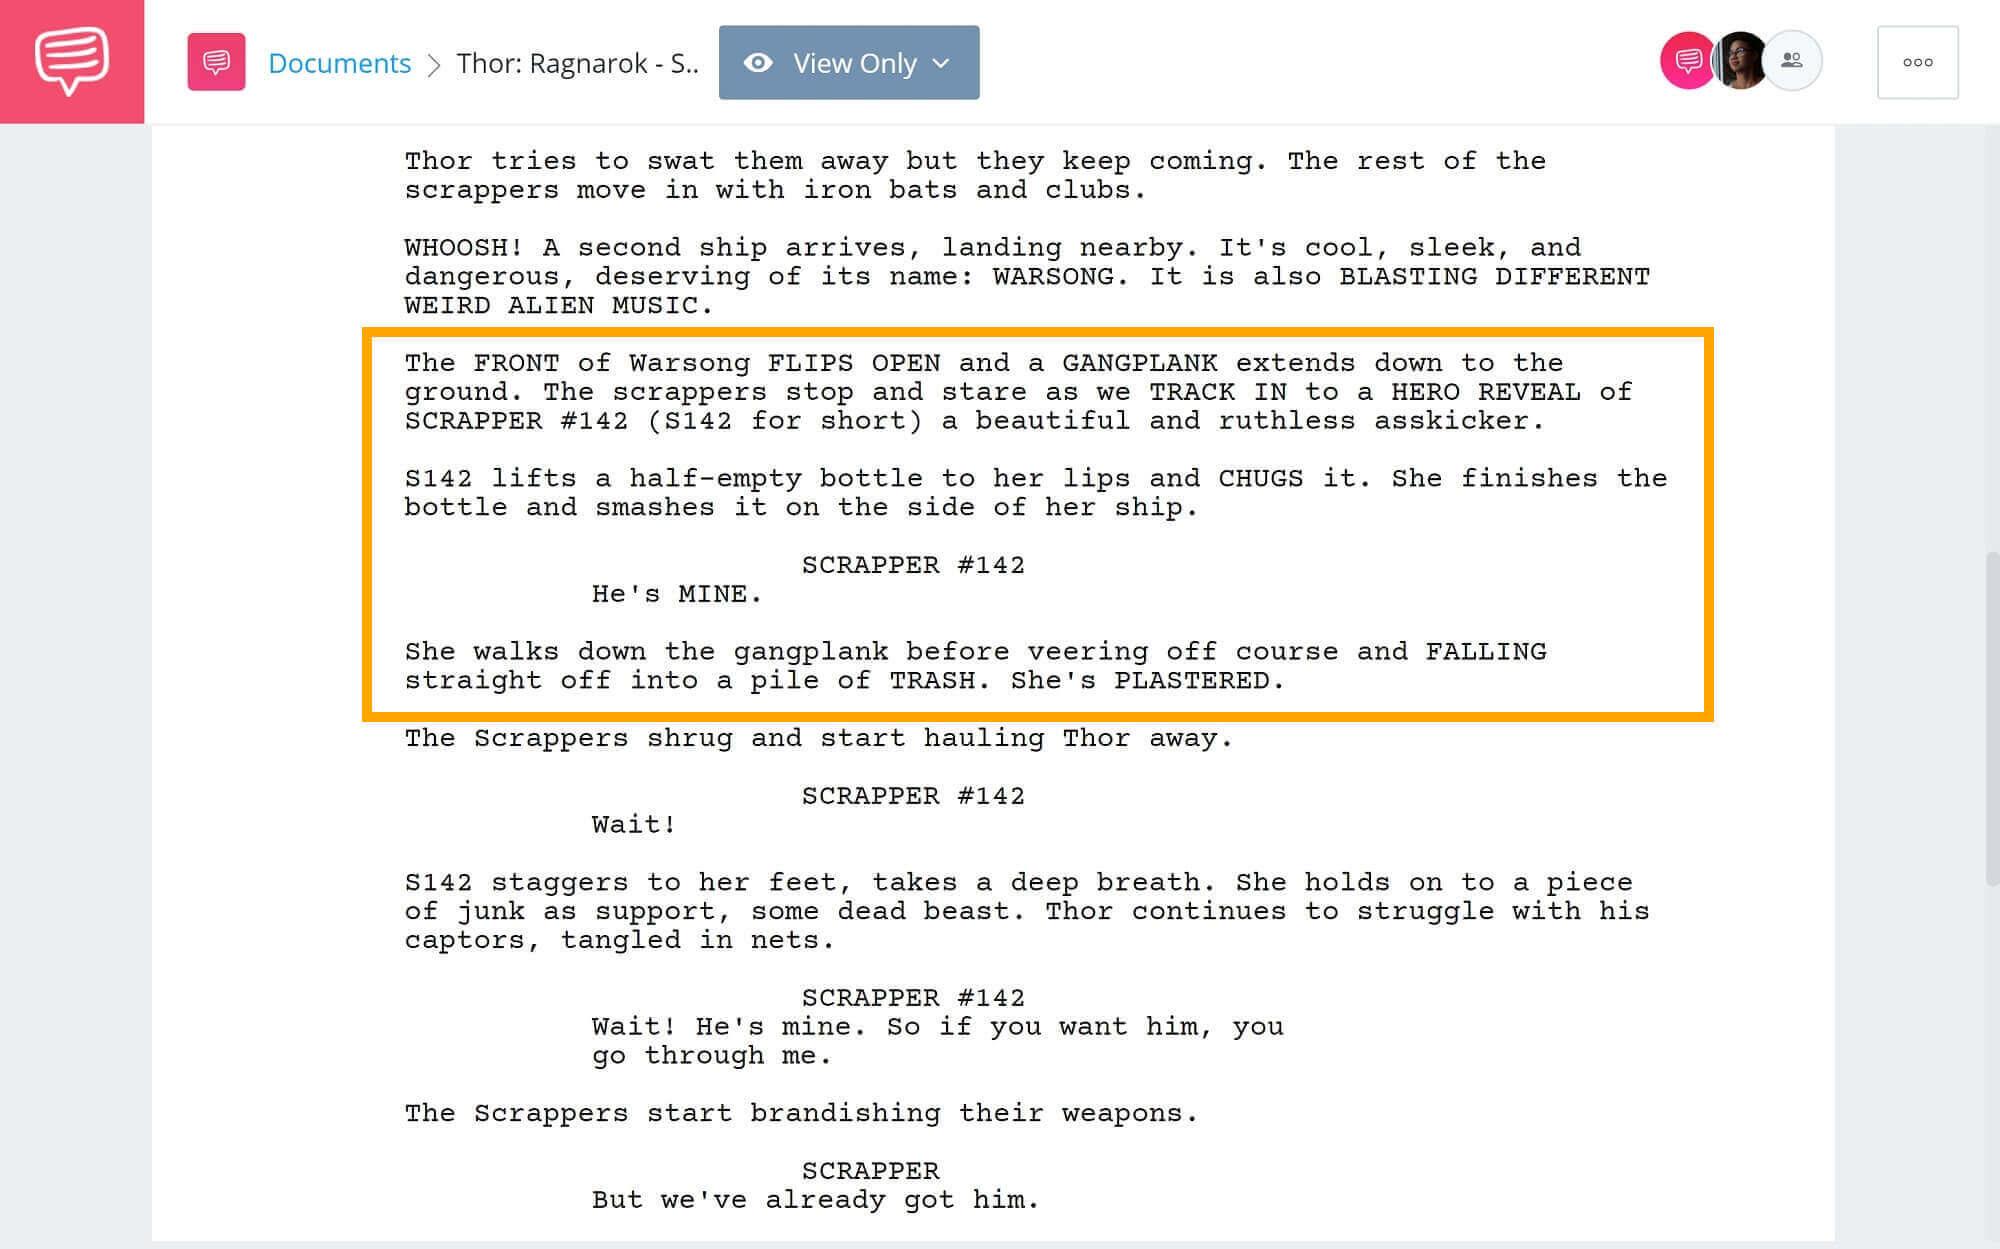 Thor-Ragnarok-Script-Teardown-Series-Scrapper-142-StudioBinder-Scriptwriting-Software